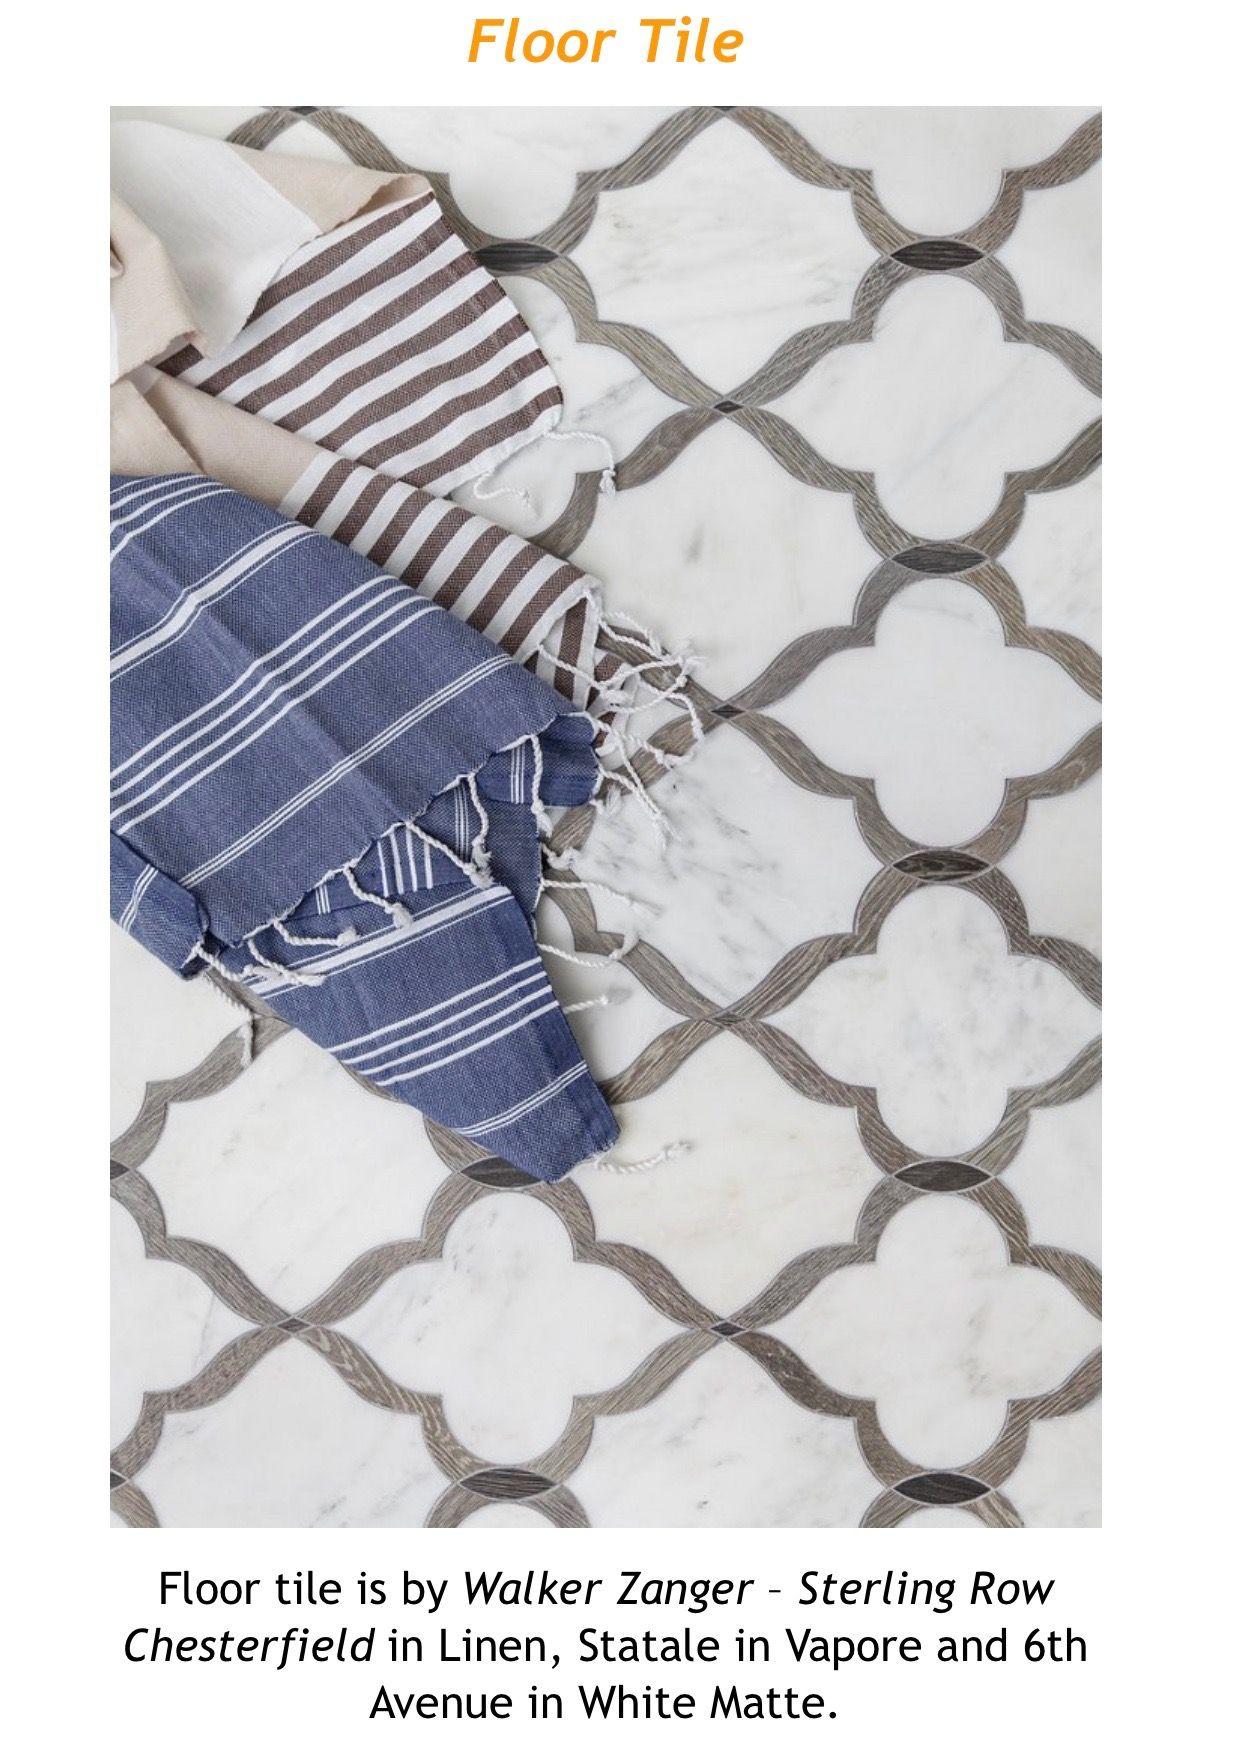 Pin By Christy Pilkington On Tile Ideas Mosaic Flooring Kitchen Flooring Tile Bathroom